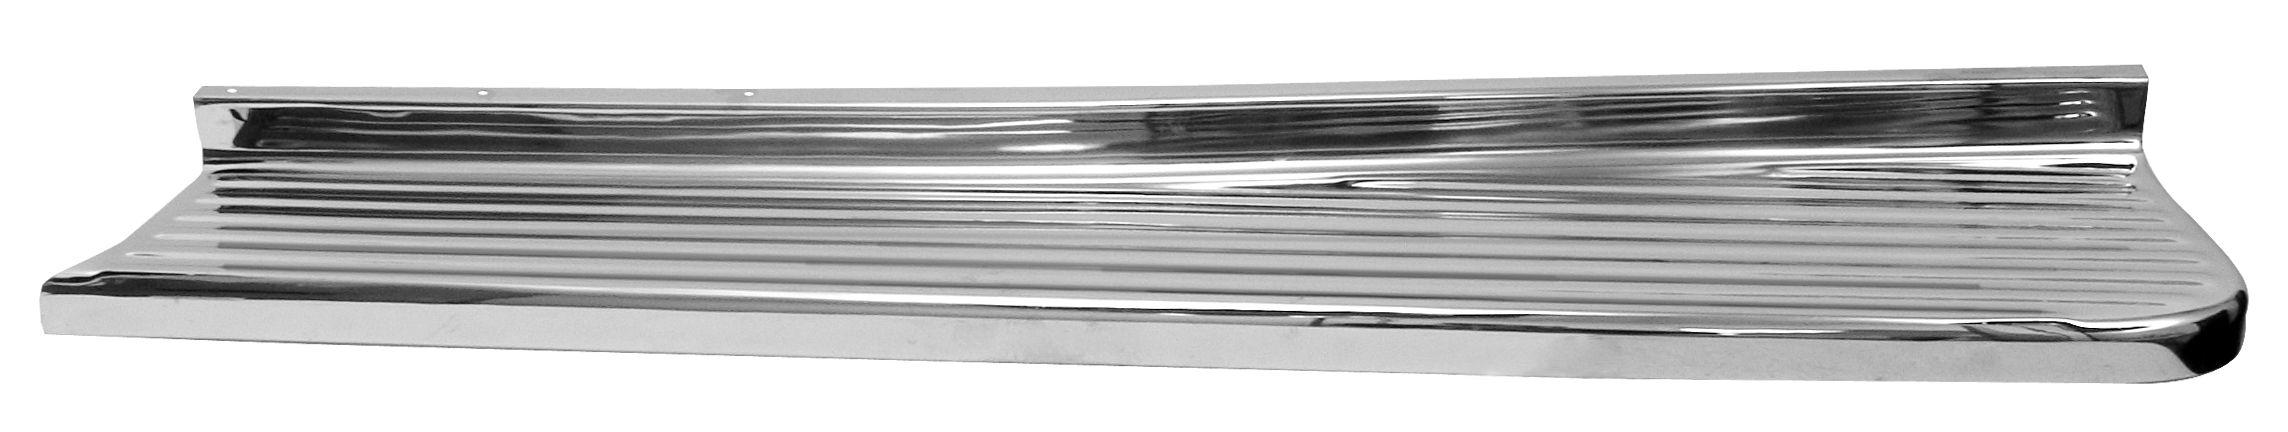 1947-54 C10 chrome running boards rt